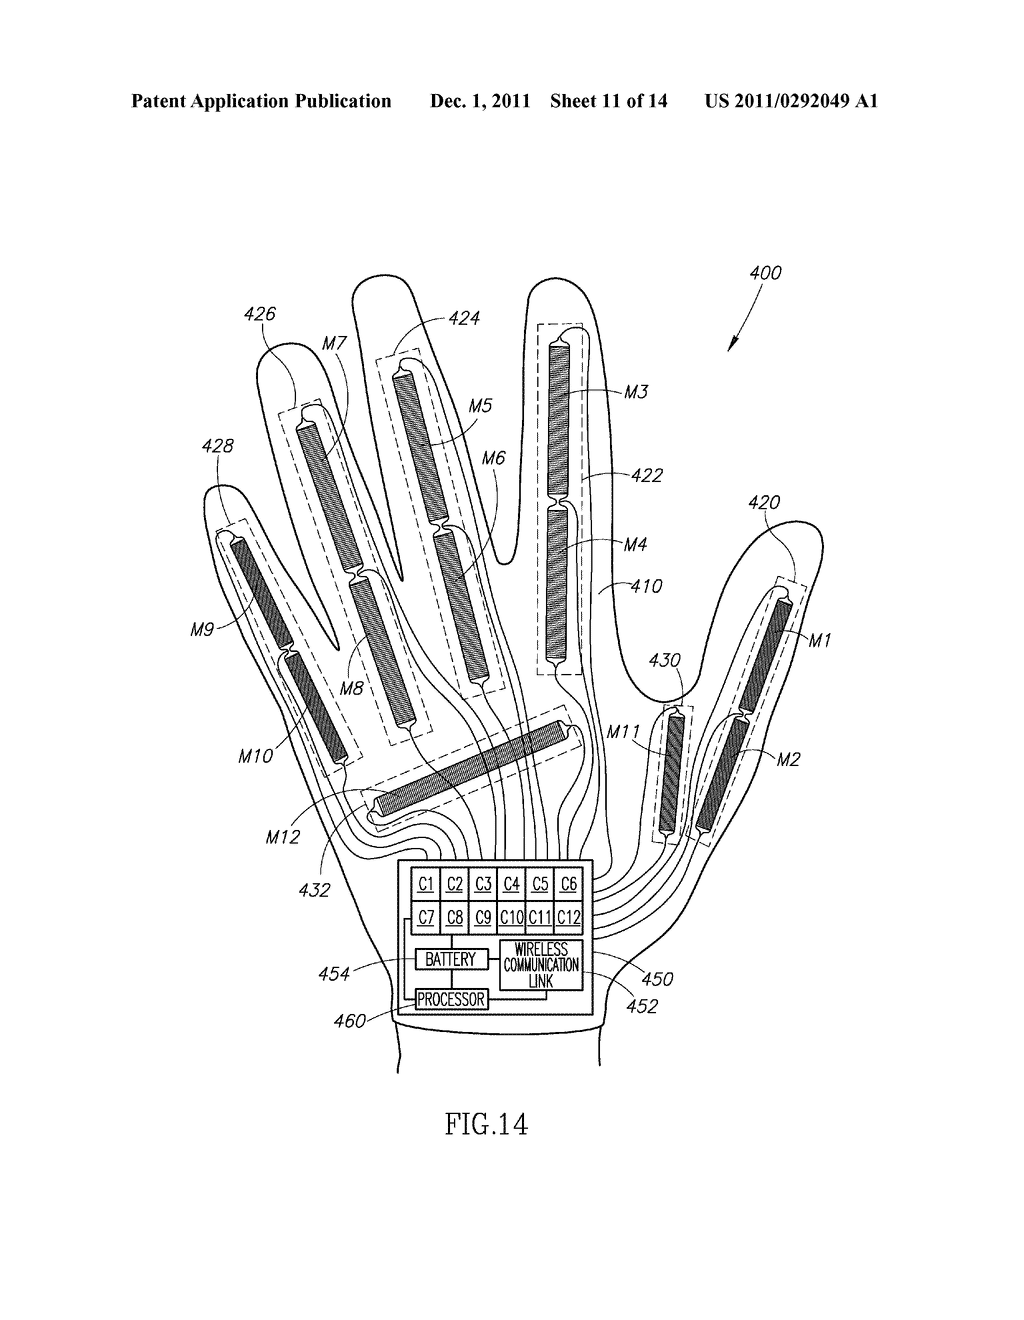 Motion Sensor Diagram Schematic And Image 12 Pir